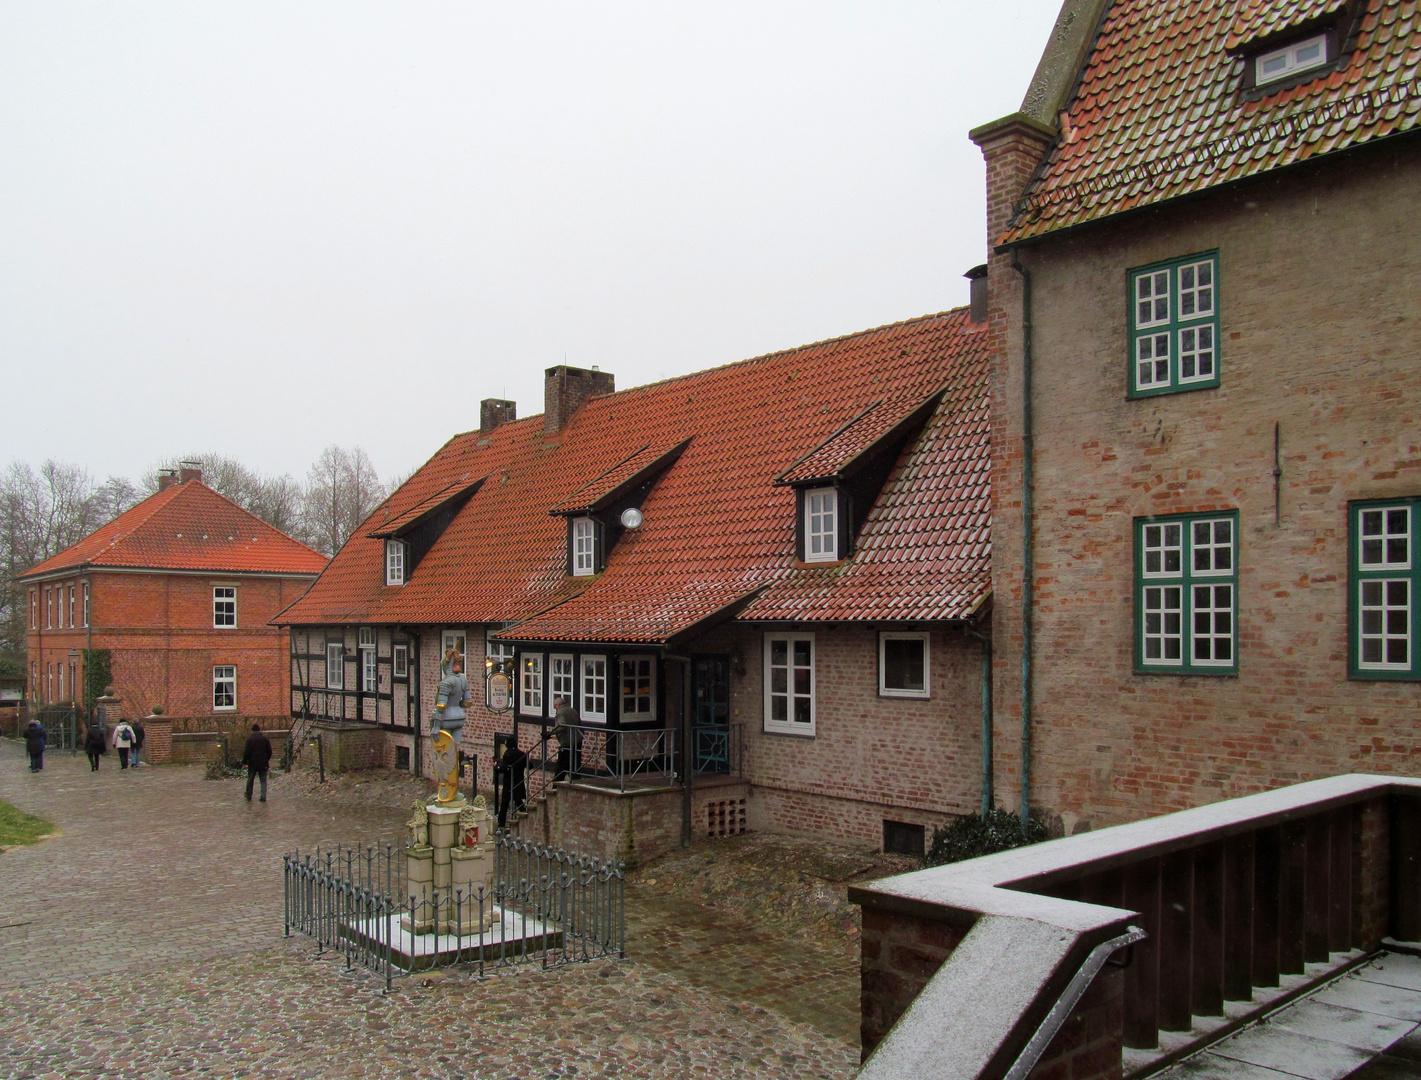 im Burghof der Burg in Bad Bederkesa ... Foto & Bild | winter ...